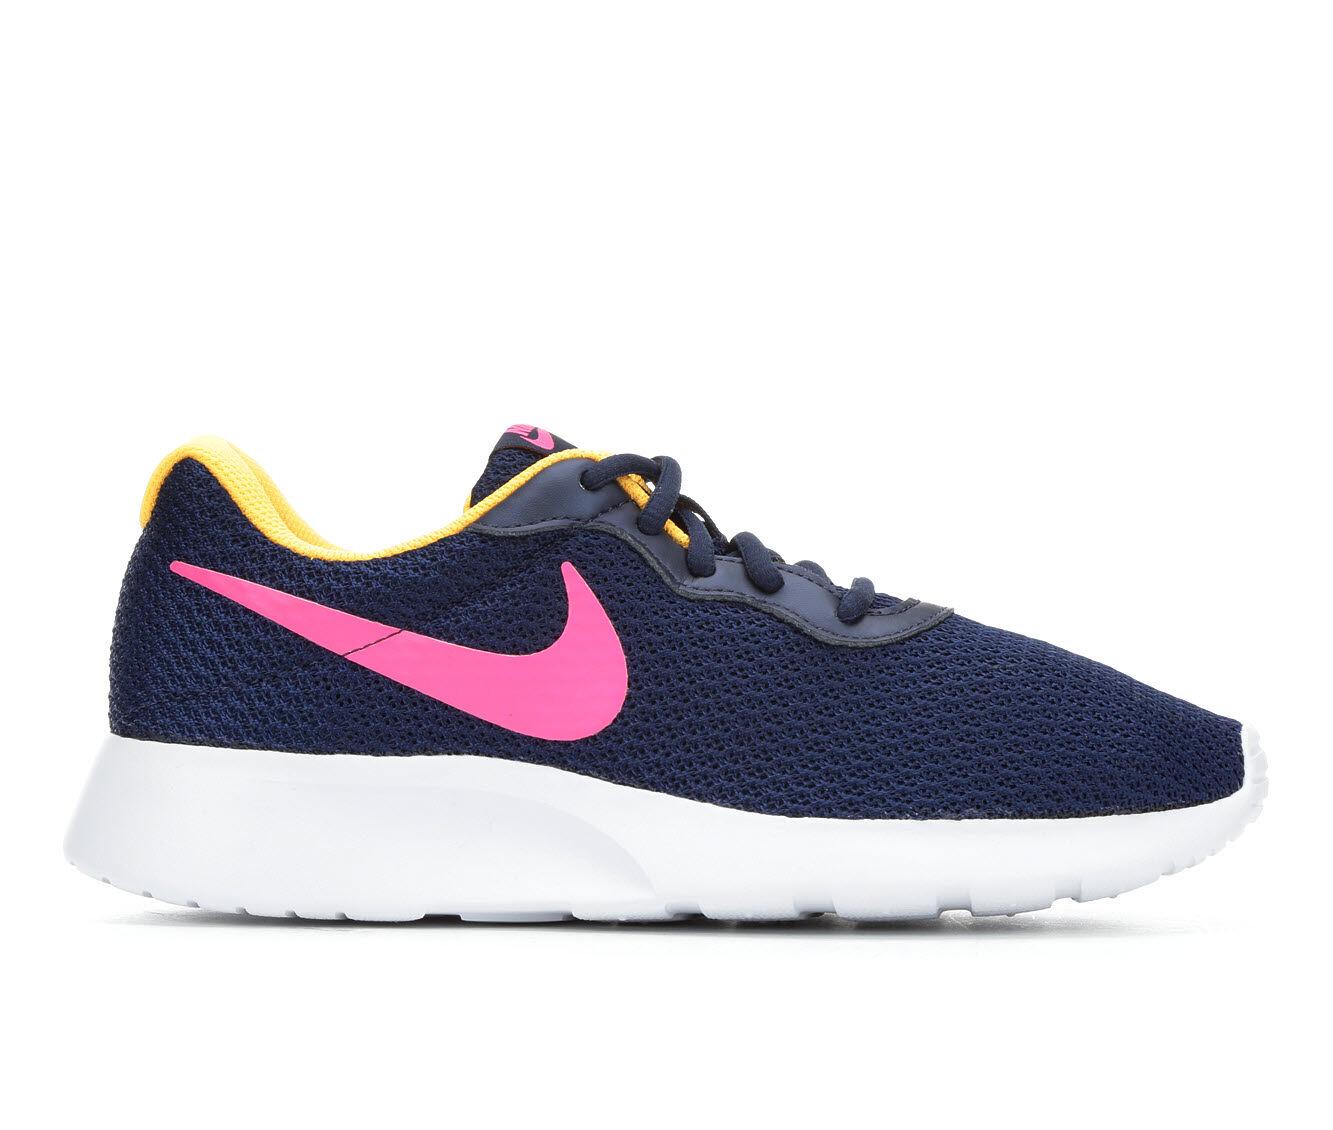 Extremely Cool Women's Nike Tanjun Sneakers Navy/Pink/Org